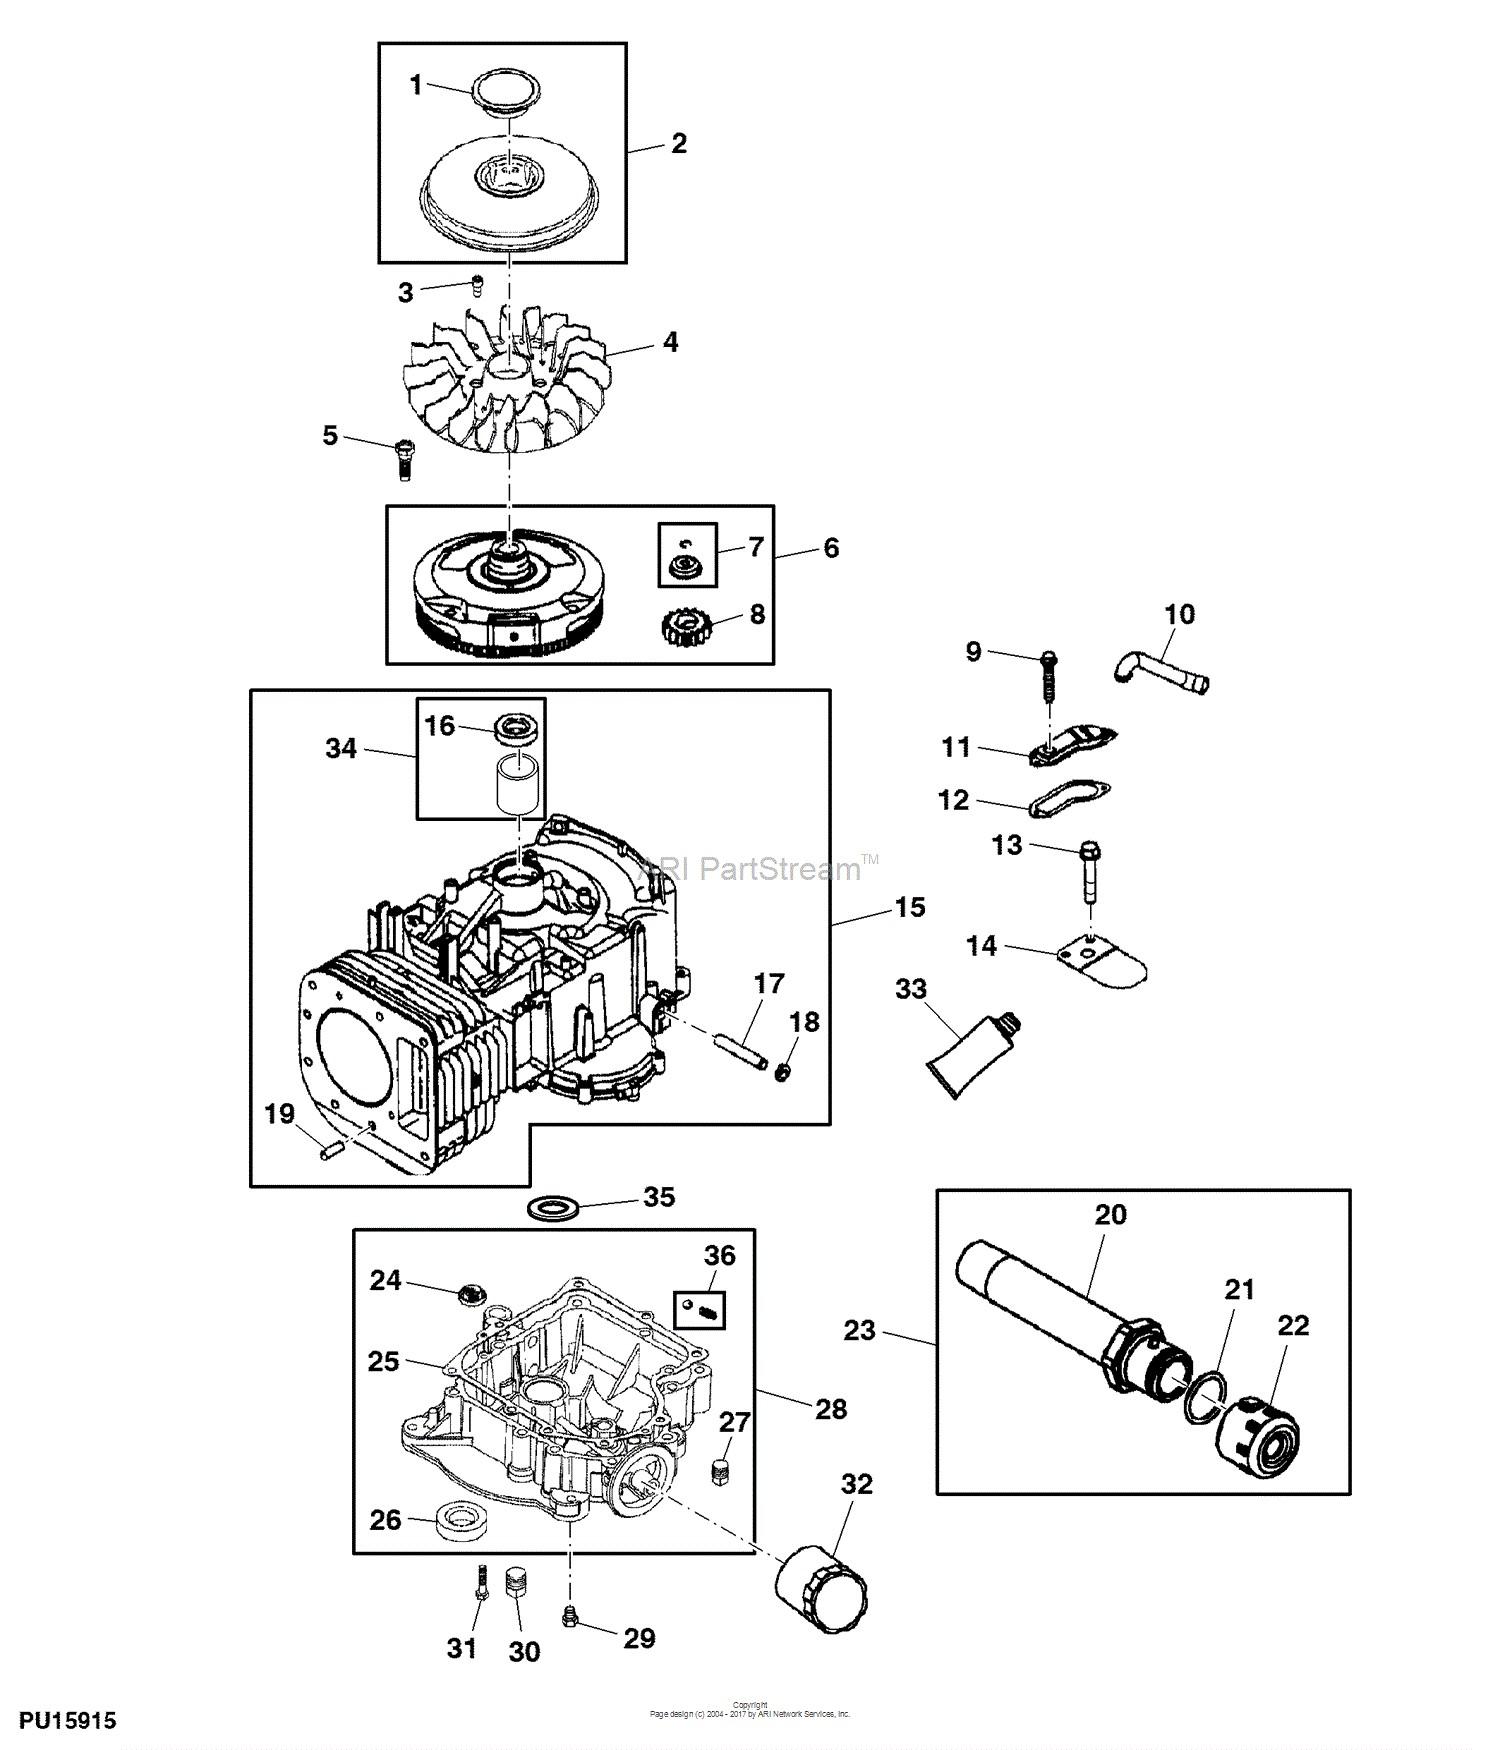 John Deere La105 Engine Diagram John Deere Parts Diagrams John Deere La105 Tractor Pc9740 Of John Deere La105 Engine Diagram